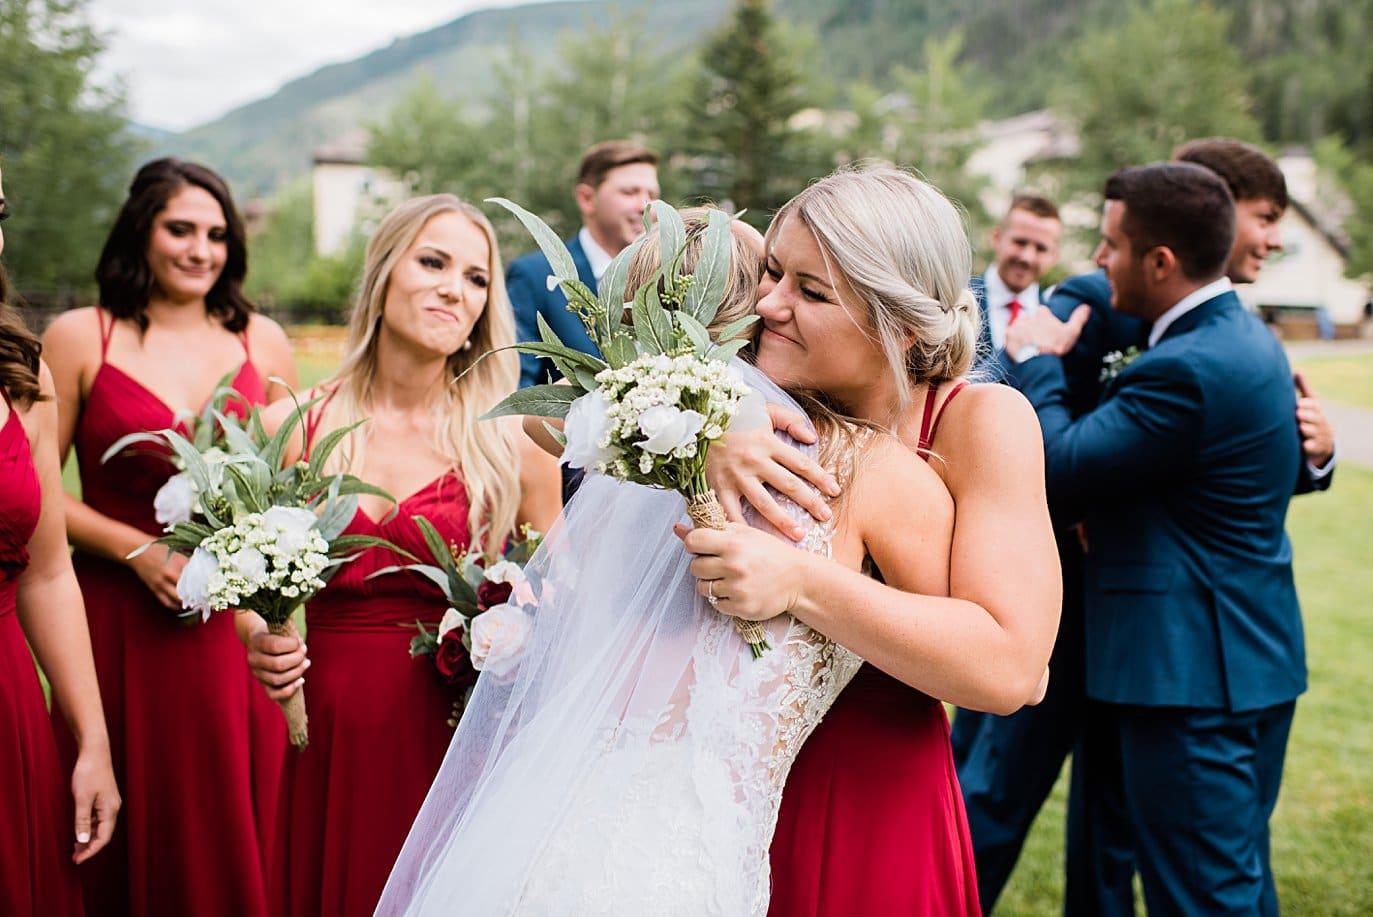 bride hugs bridesmaid at Larkspur Vail Wedding by Breckenridge Wedding photographer Jennie Crate